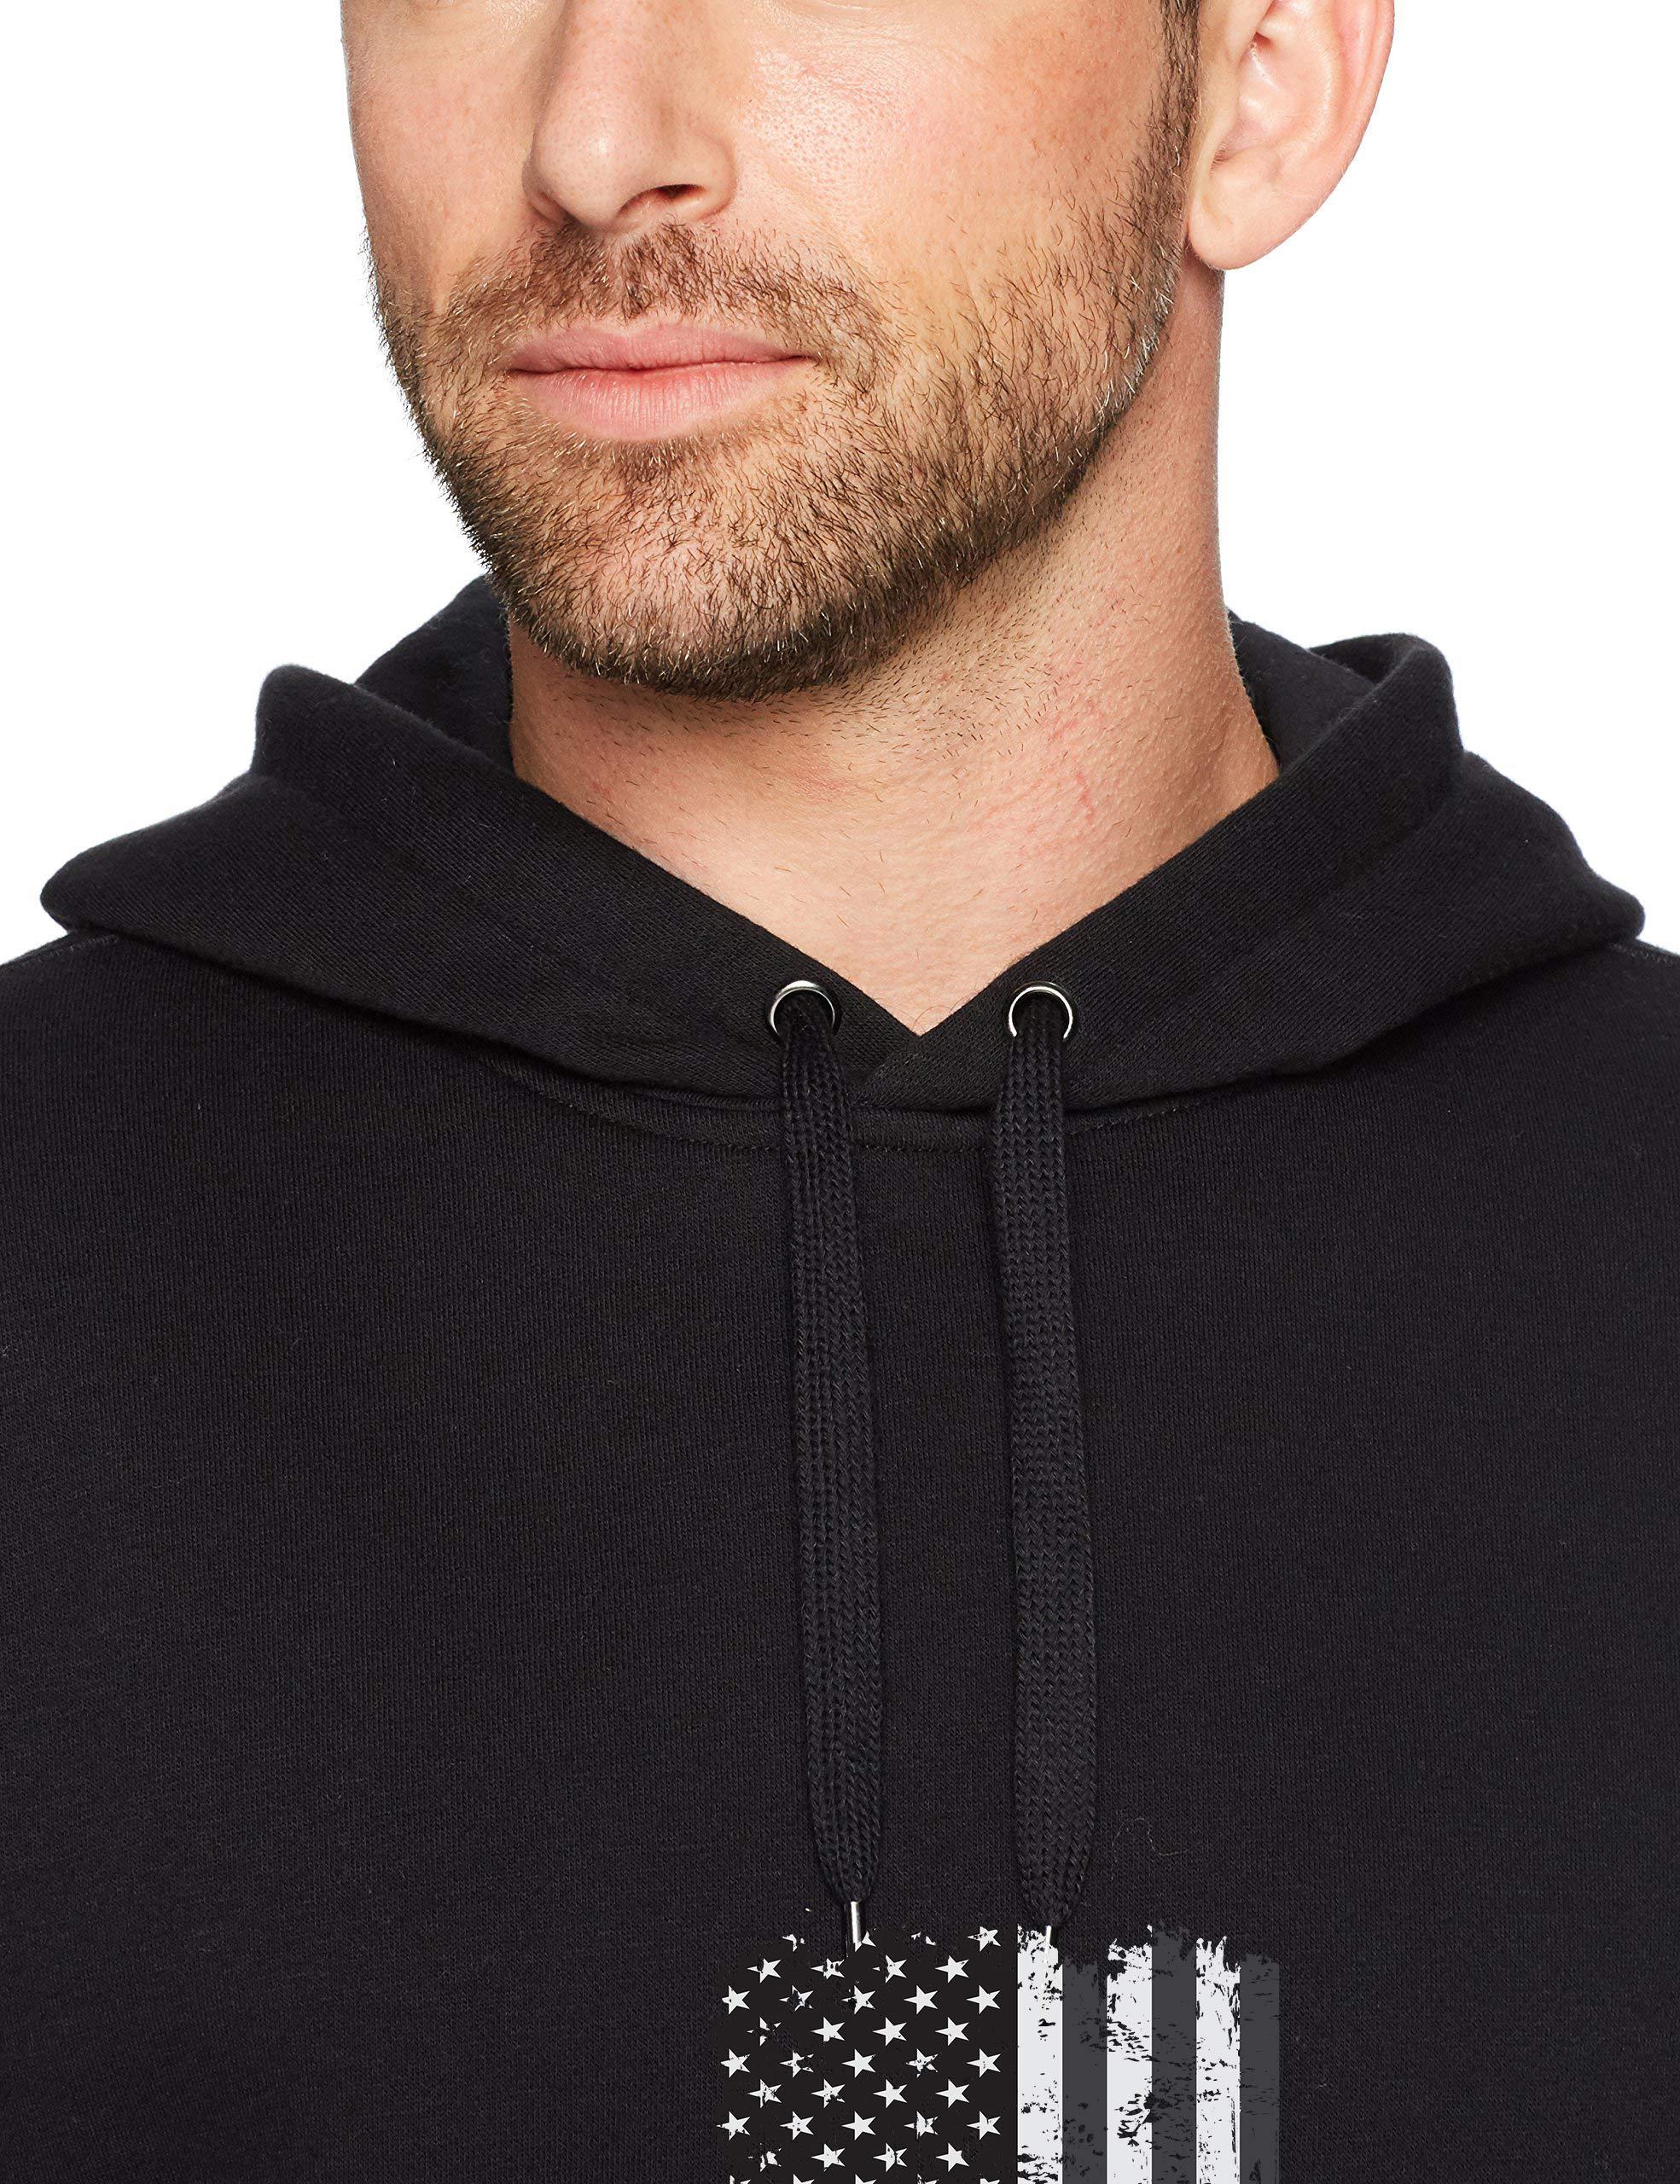 Mens Distressed USA Flag Black Hoodie - Trendy Crewneck College Sweatshirts Apparel Vintage Pullover Hoody Cool Sweater with Drawstrings Pockets Large